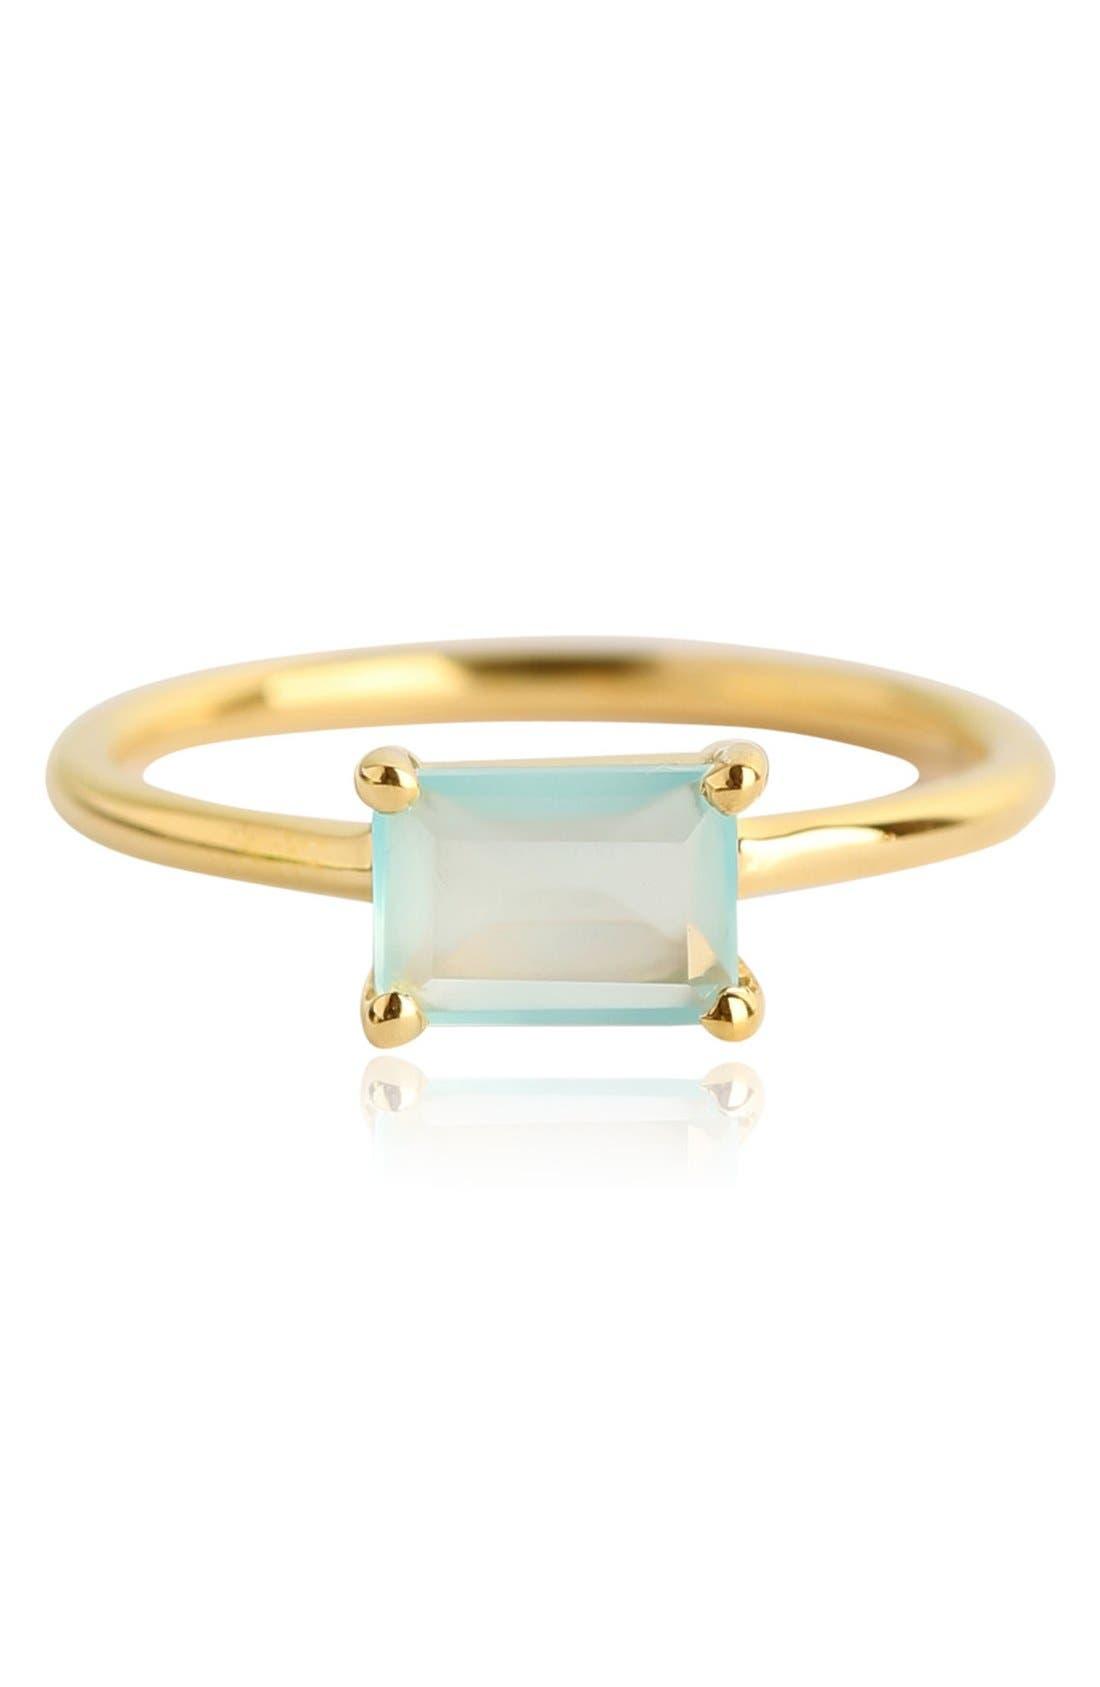 Baguette Stone Ring,                         Main,                         color, Gold/ Aqua Chalcedony